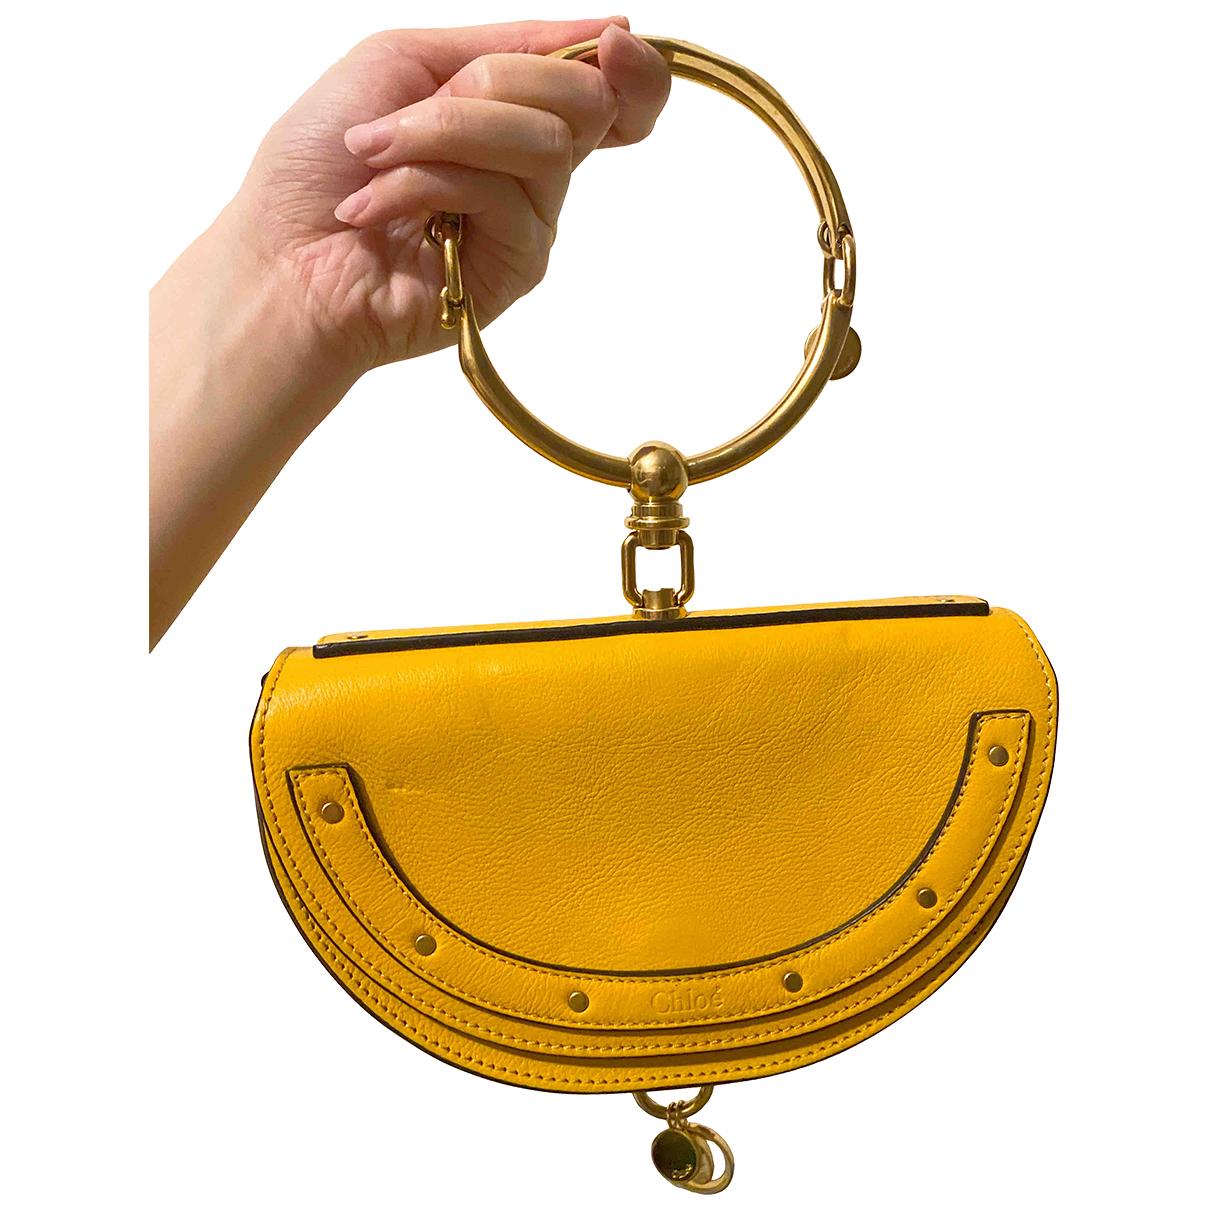 Chloe Bracelet Nile Handtasche in  Gelb Leder